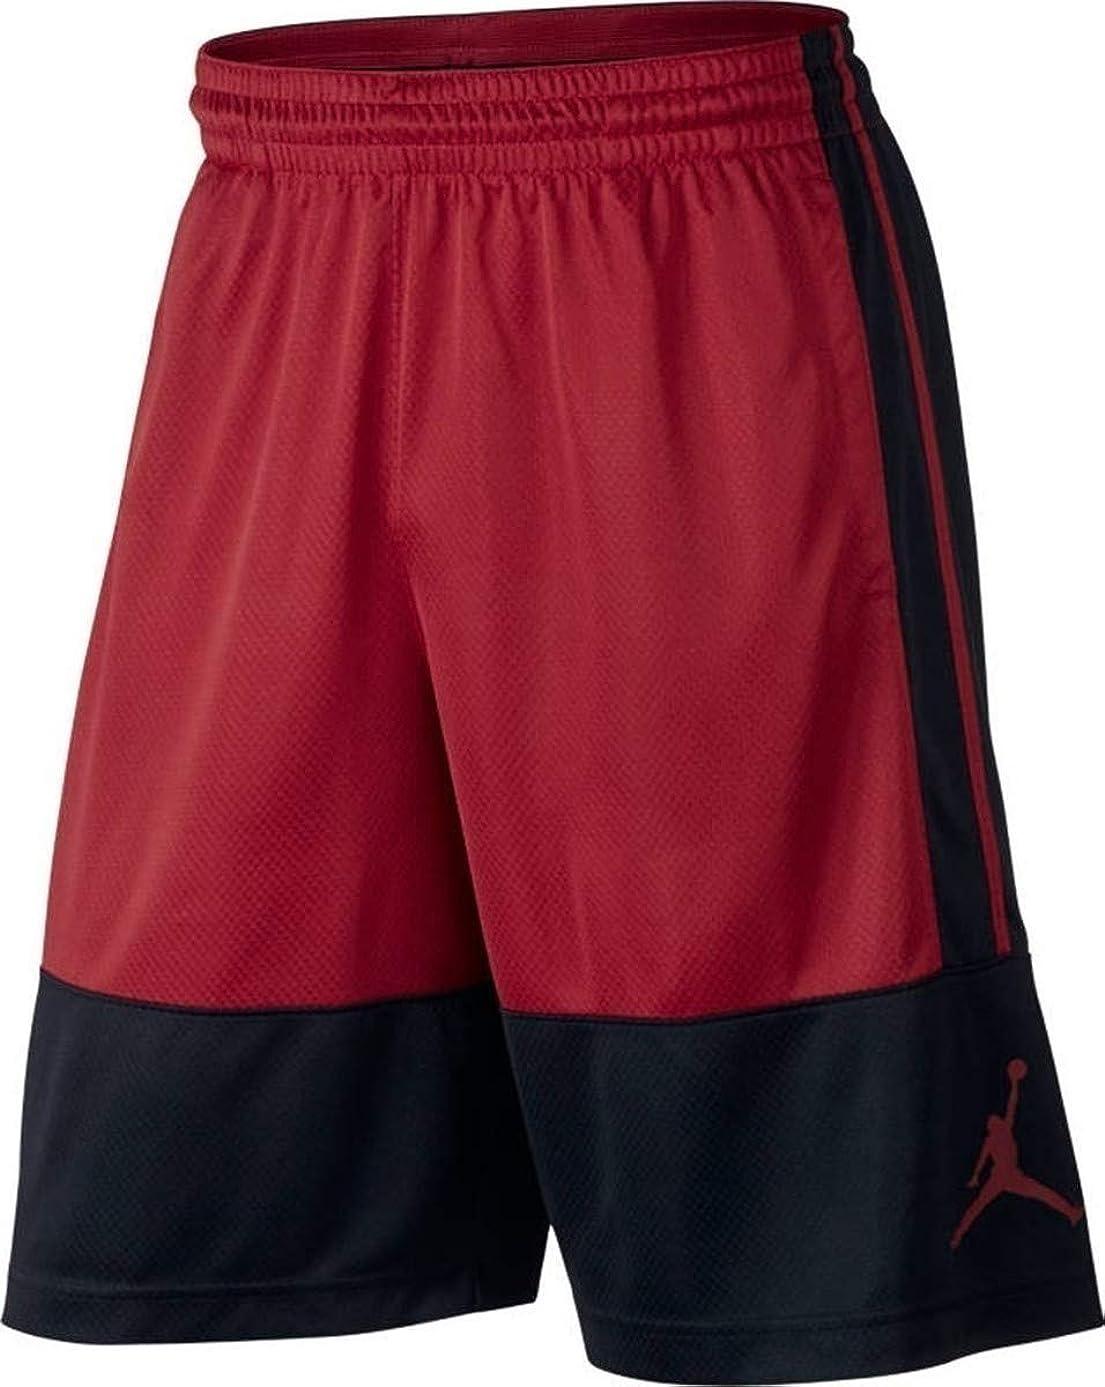 Nike Air Jordan Rise Red/Black Mens Basketball Shorts vokv2738698